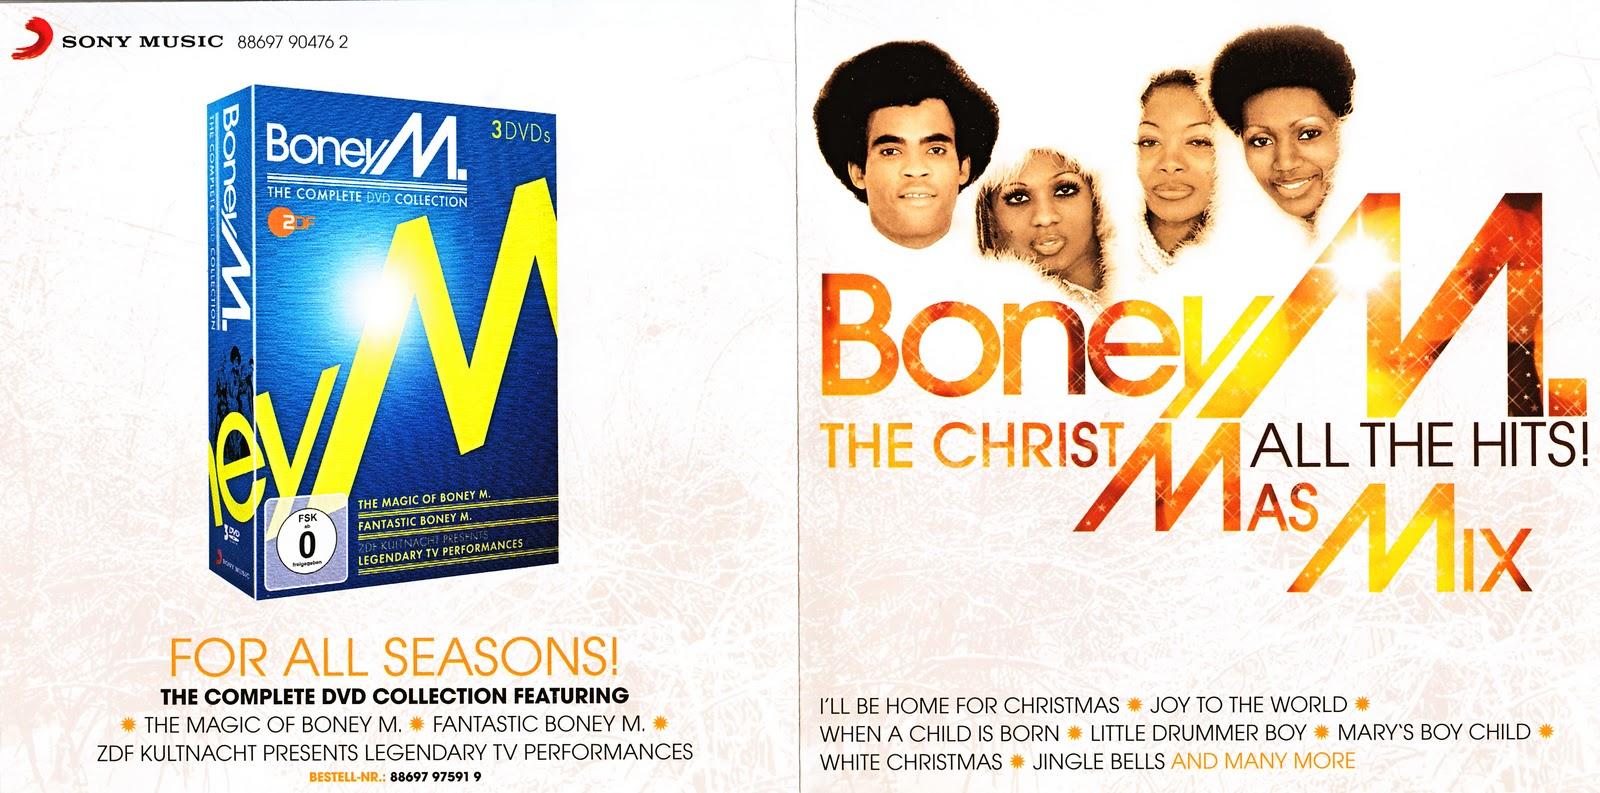 Boney M. Mania: Boney M - The Christmas Mix (All The Hits 2011)